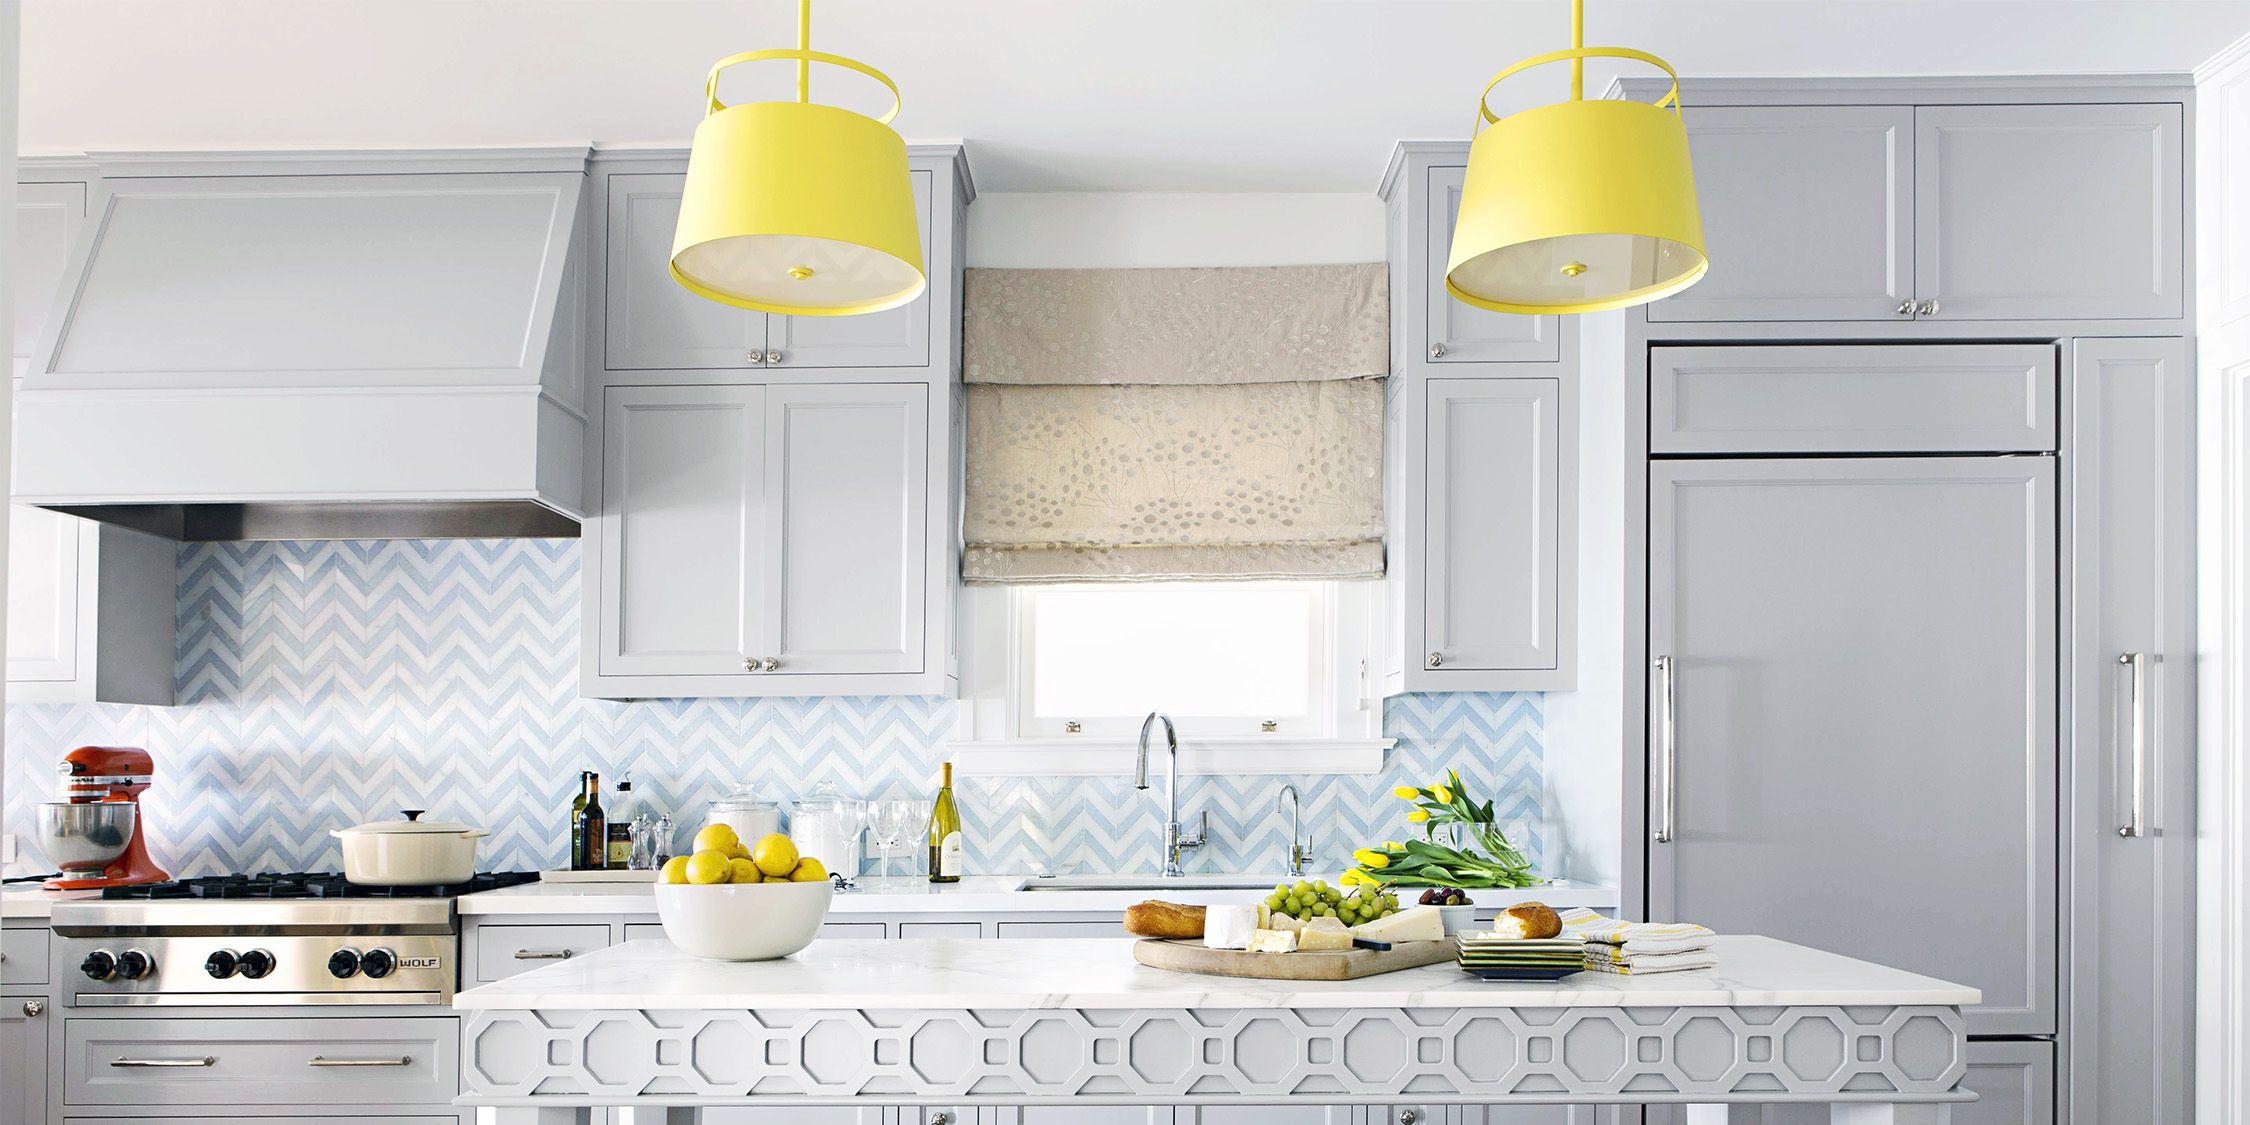 60 Best Kitchen Ideas – Decor and Decorating Ideas for Kitchen Design